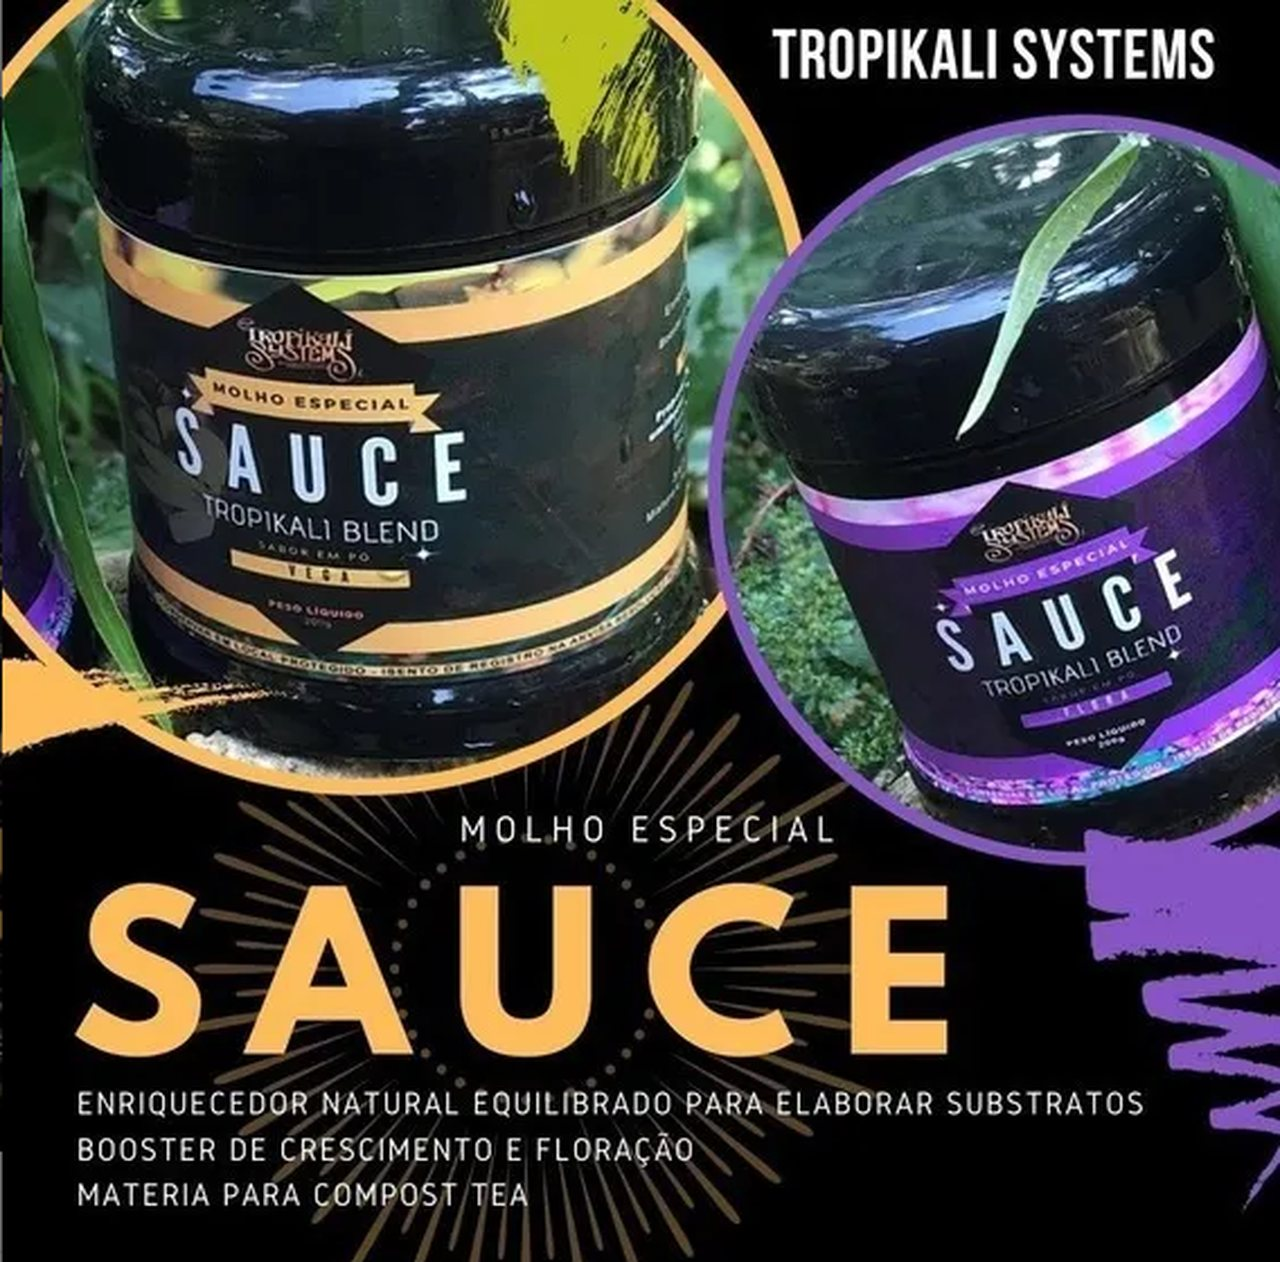 Tropikali Sauce VEGA 200g